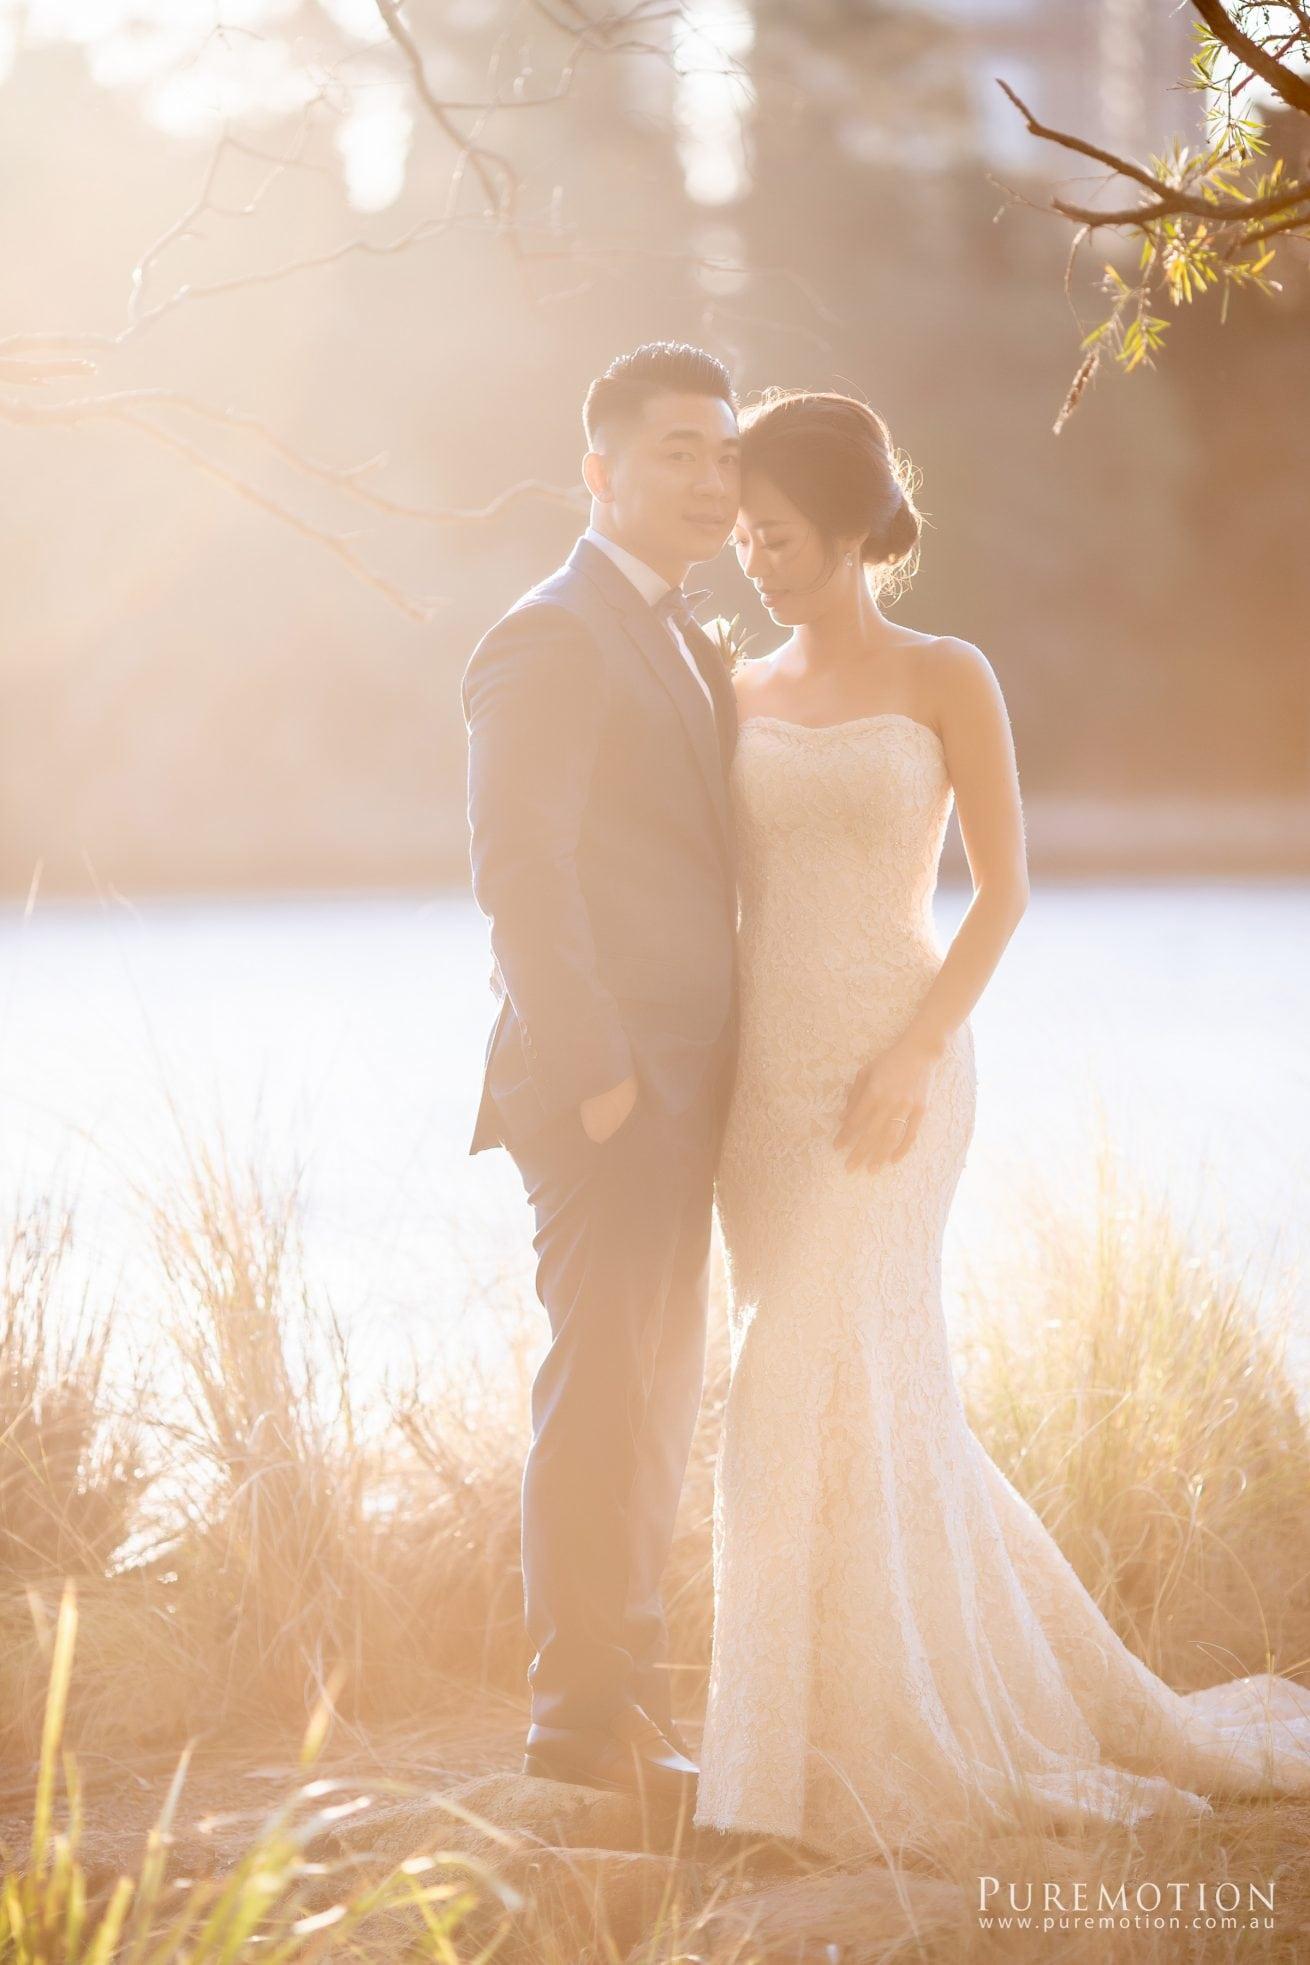 Puremotion Wedding Photography Alex Huang Brisbane W Hotel096